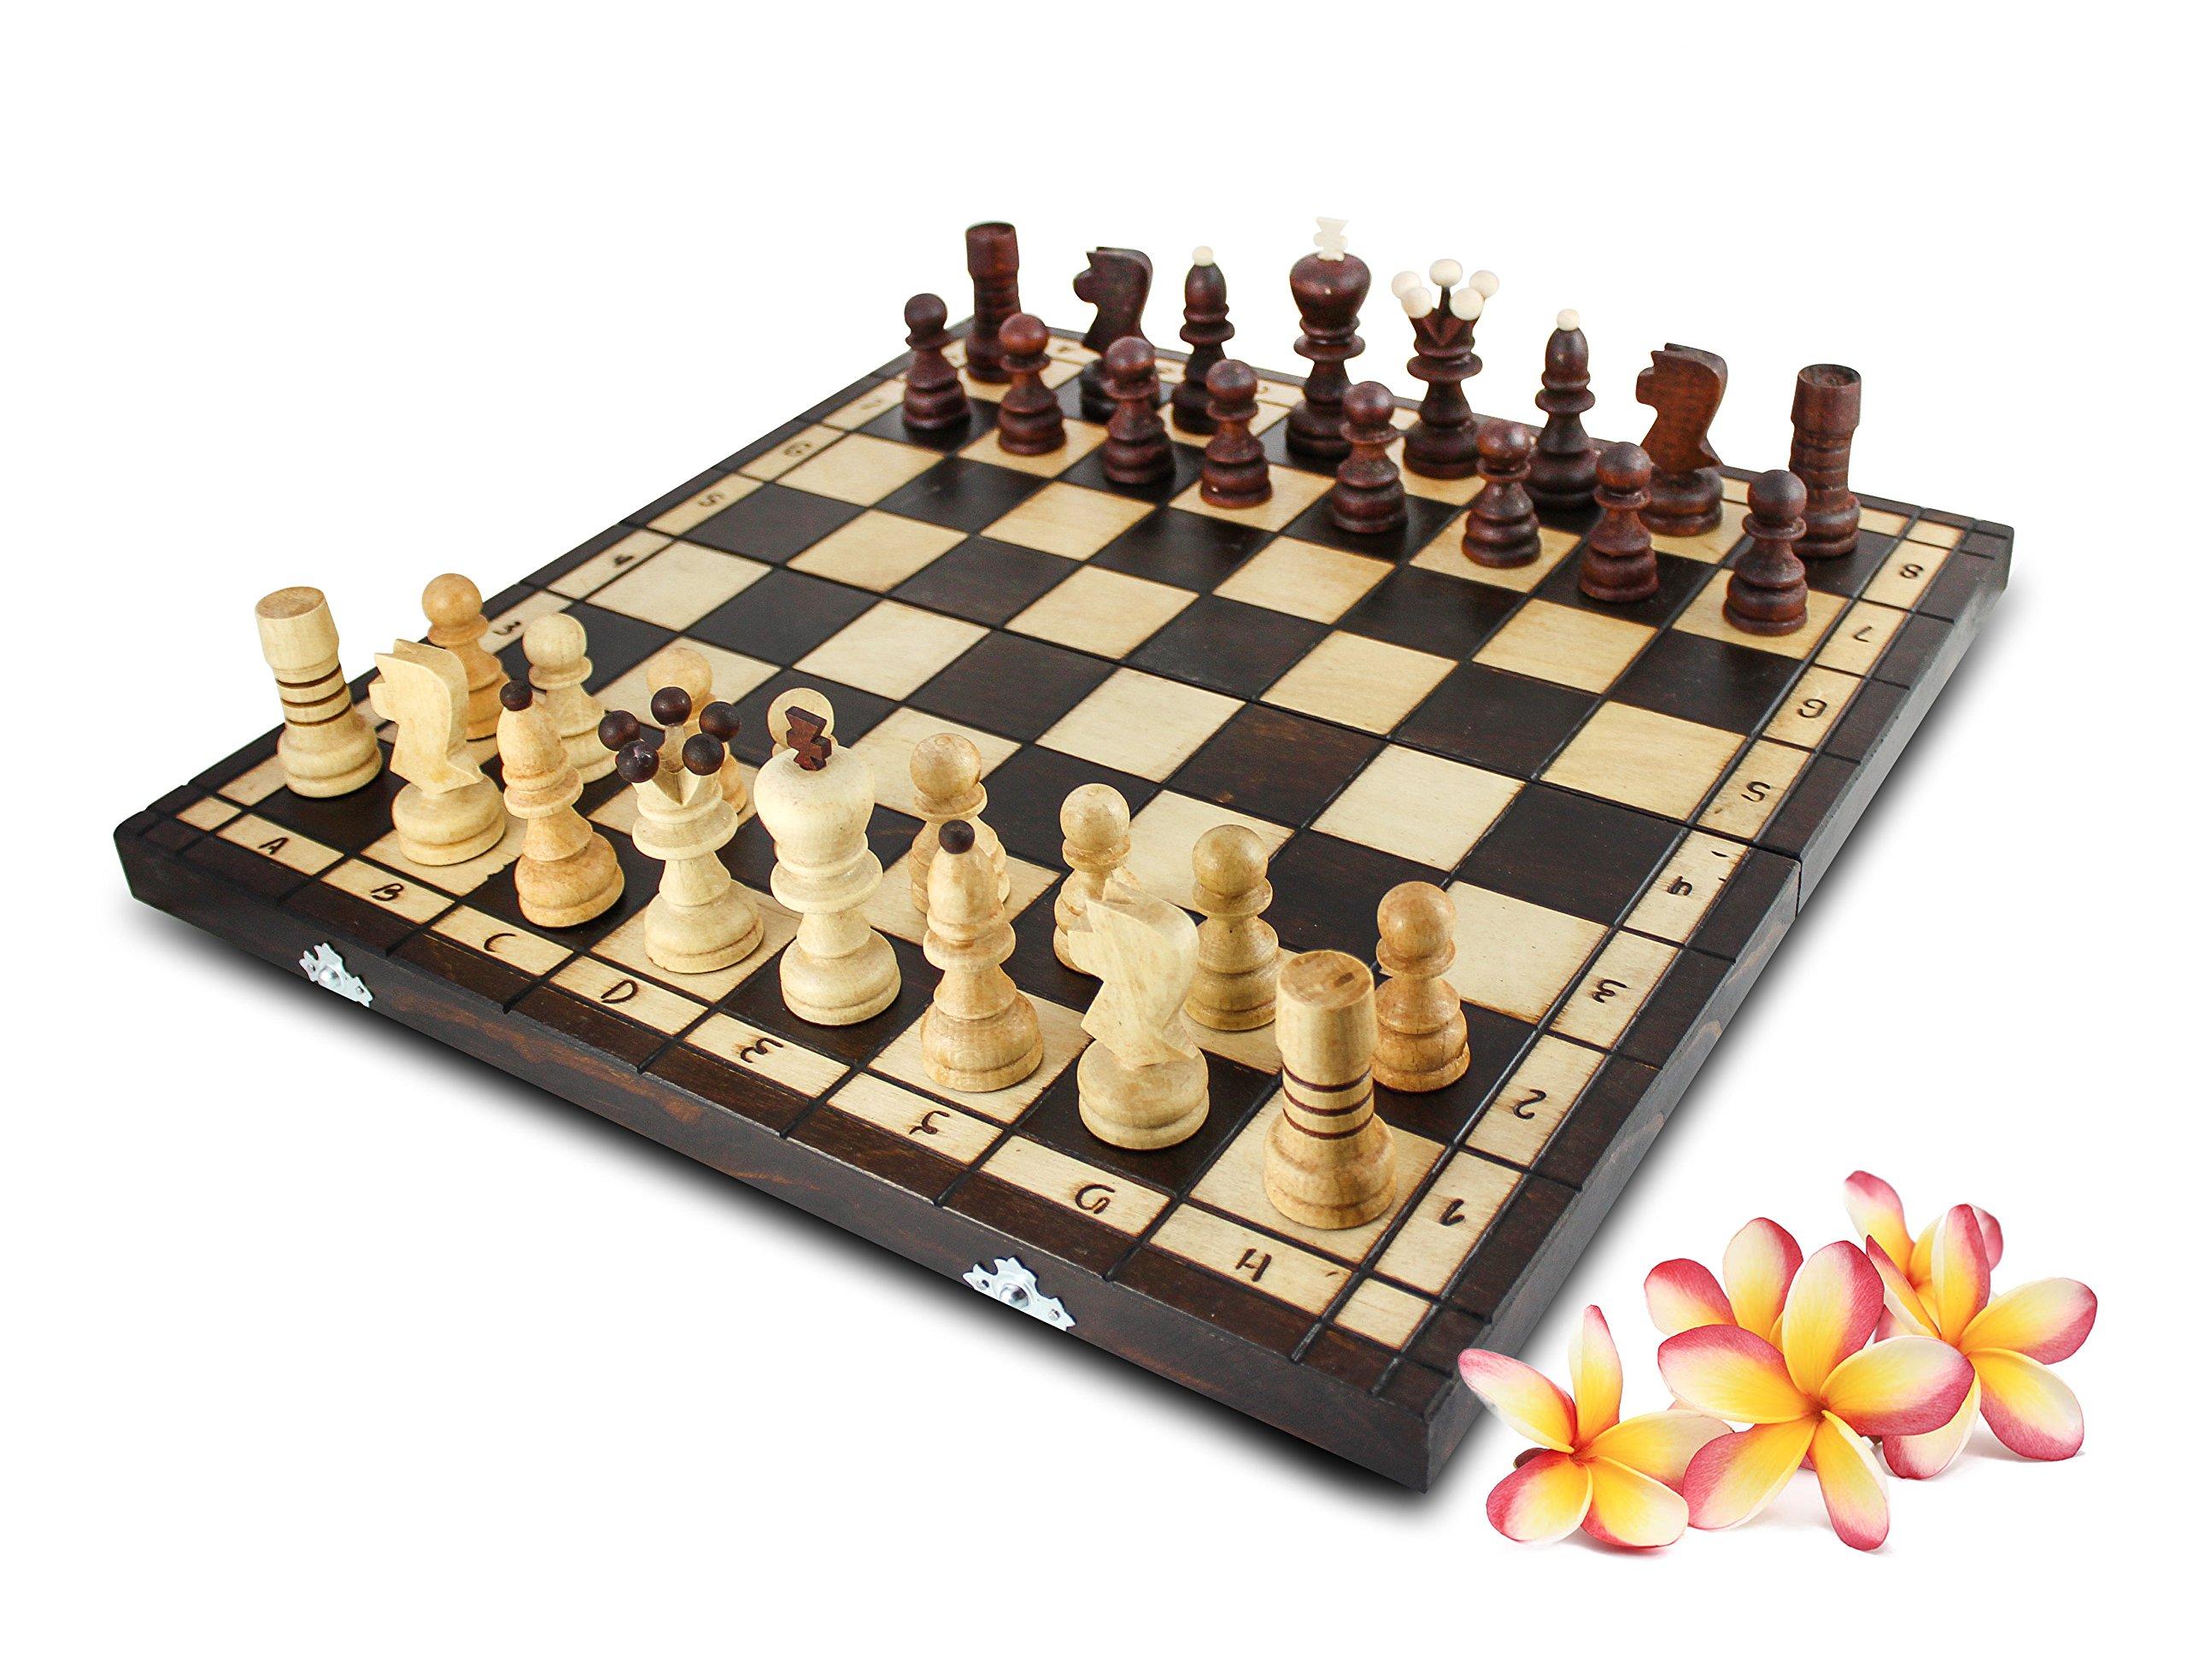 Schach-42x42cm-Handarbeit-Schachspiel-Brettspiel-Klappkoffer-inkl-Figuren-Holz Schach 42x42cm Handarbeit Schachspiel Brettspiel Klappkoffer inkl. Figuren Holz -